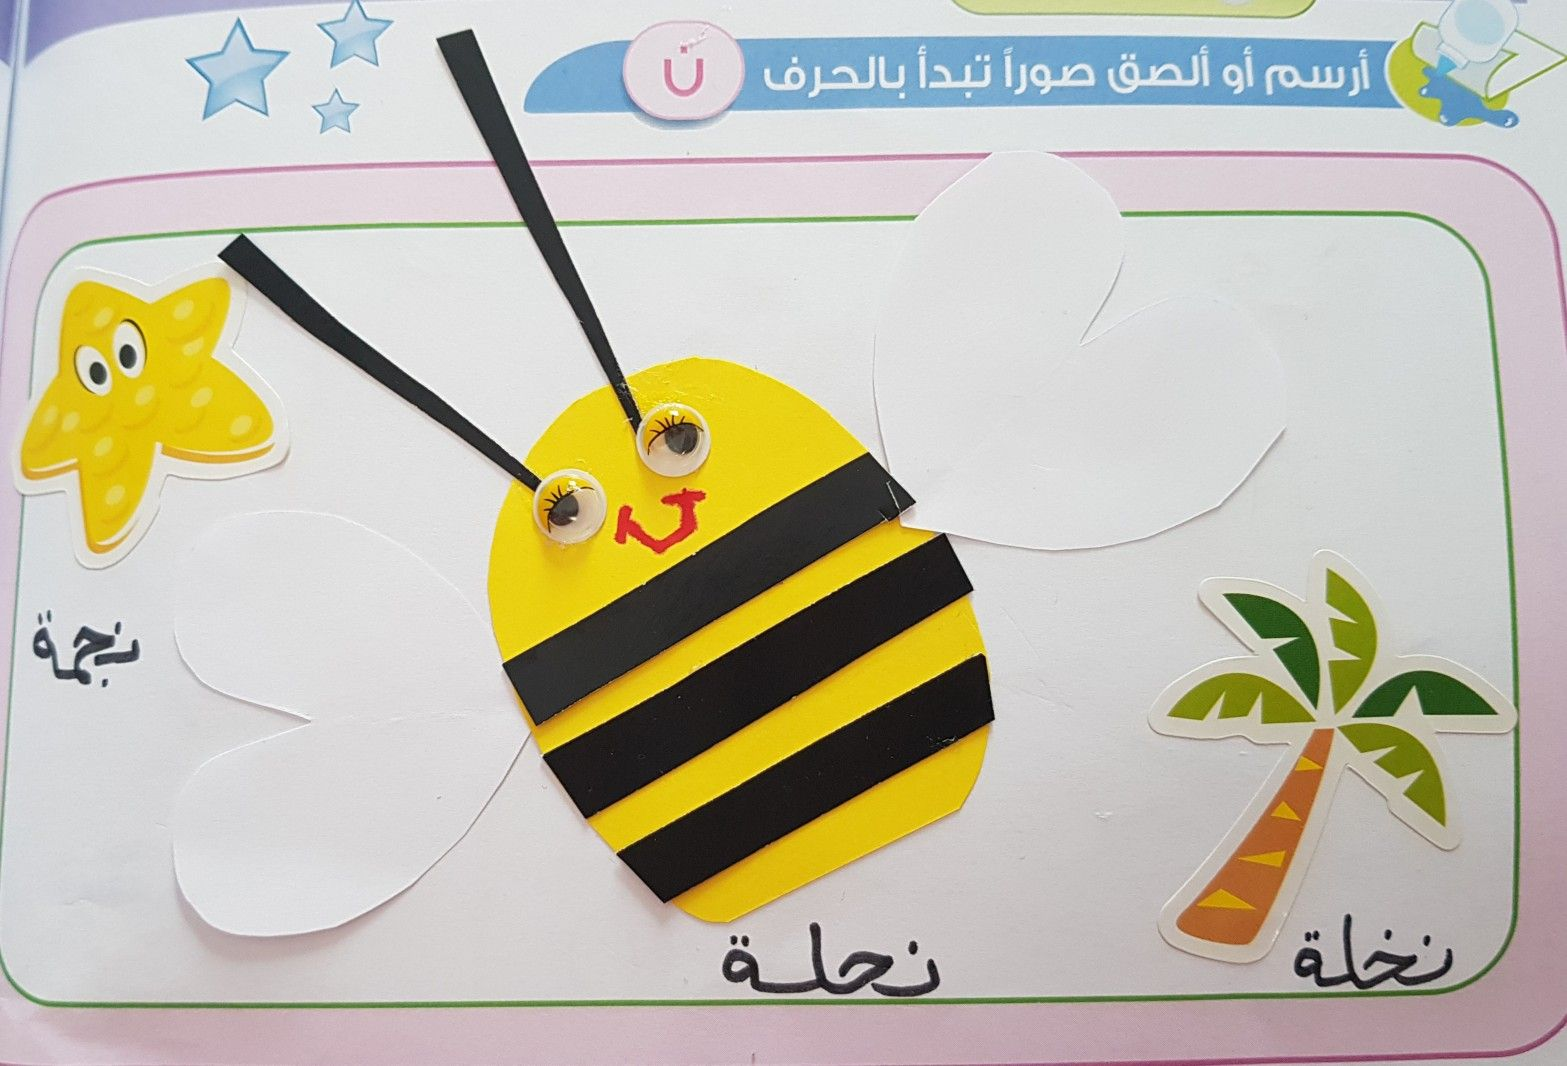 نشاط حرف ن نحلة نخلة نجمة Arabic Alphabet Letters Lettering Alphabet Arabic Alphabet